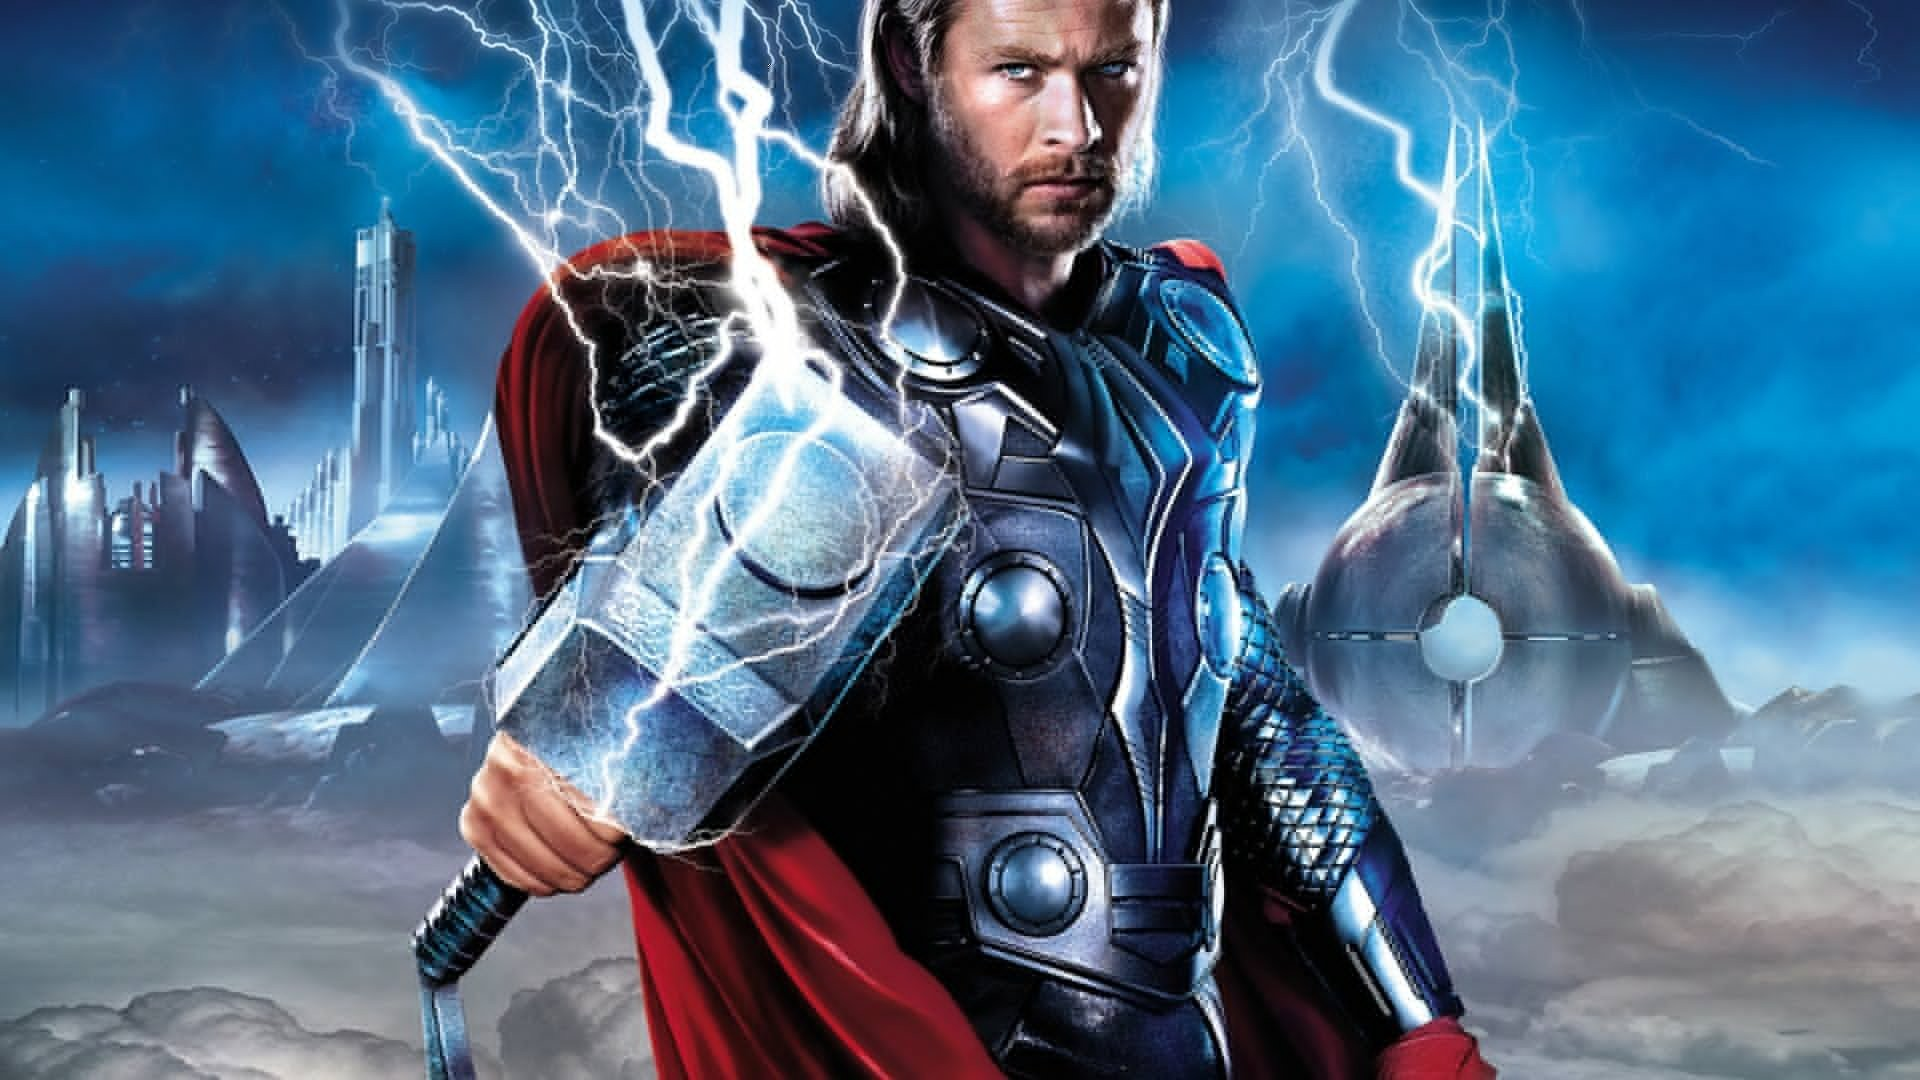 Chris Hemsworth Avengers Thor 3101928 Hd Wallpaper Backgrounds Download